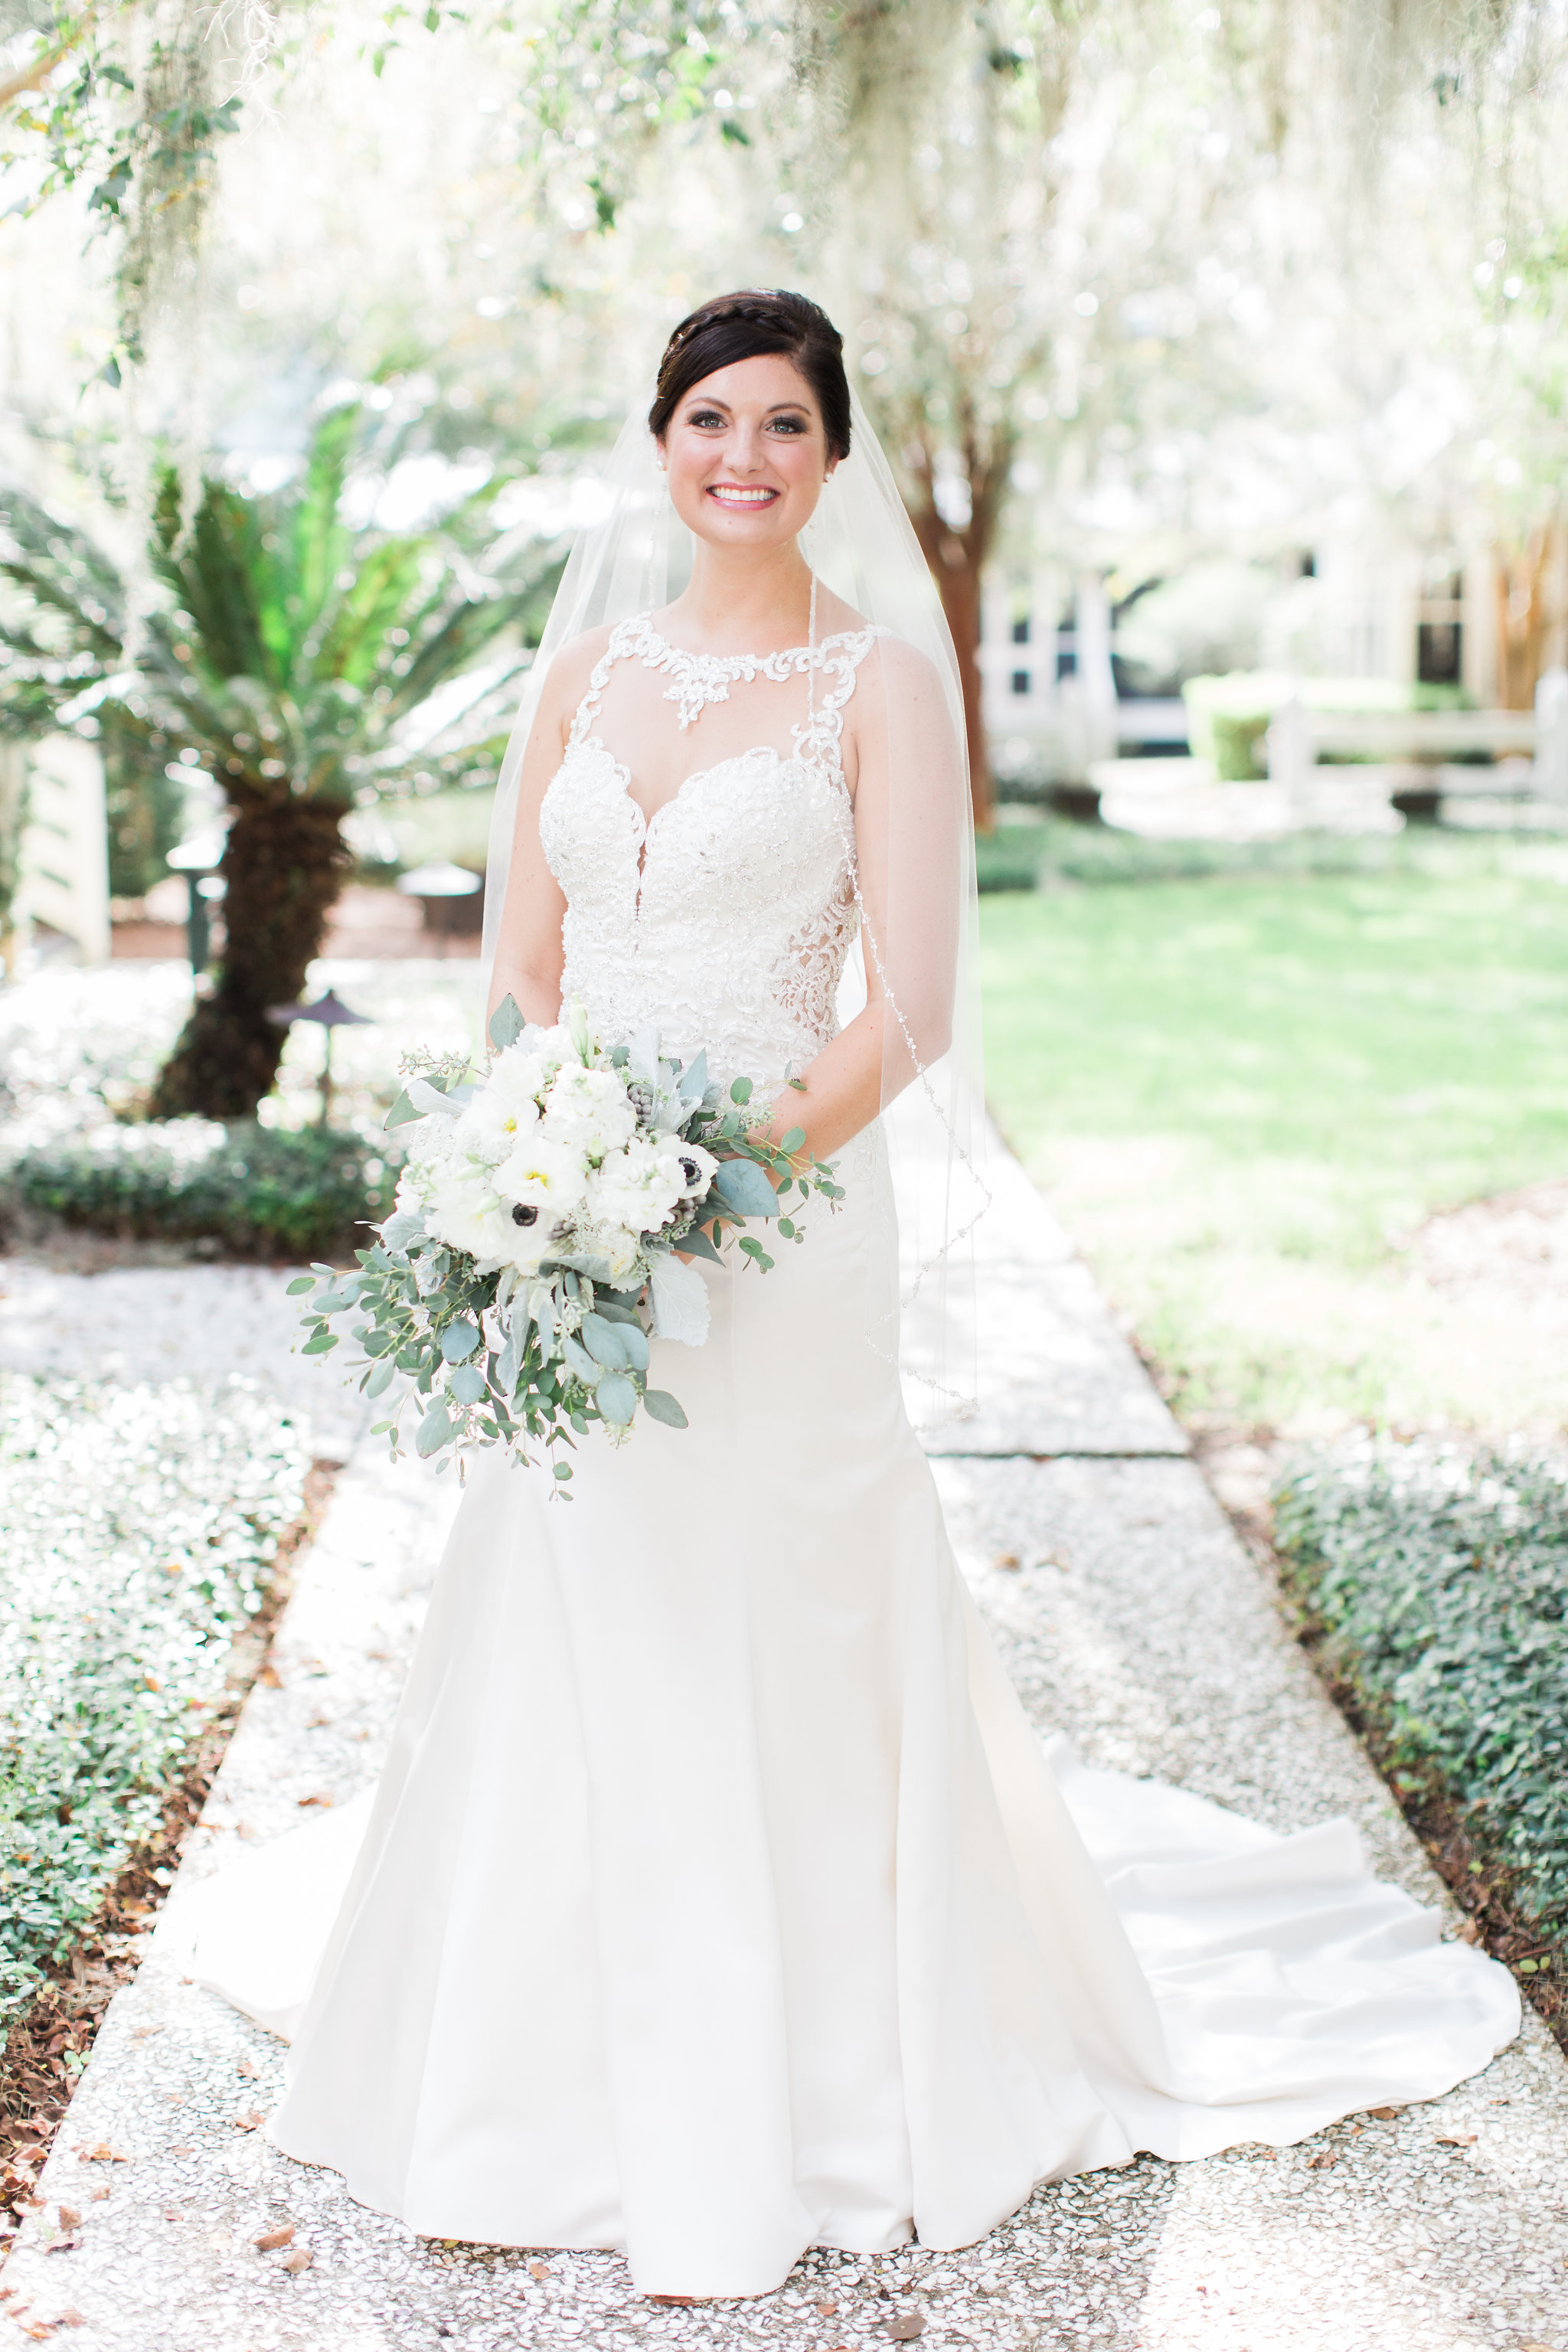 apt-b-photography-lauren-graham-oldfield-wedding-south-carolina-wedding-photographer-savannah-wedding-lowcountry-wedding-coastal-wedding-stella-york-wedding-dress-16.JPG